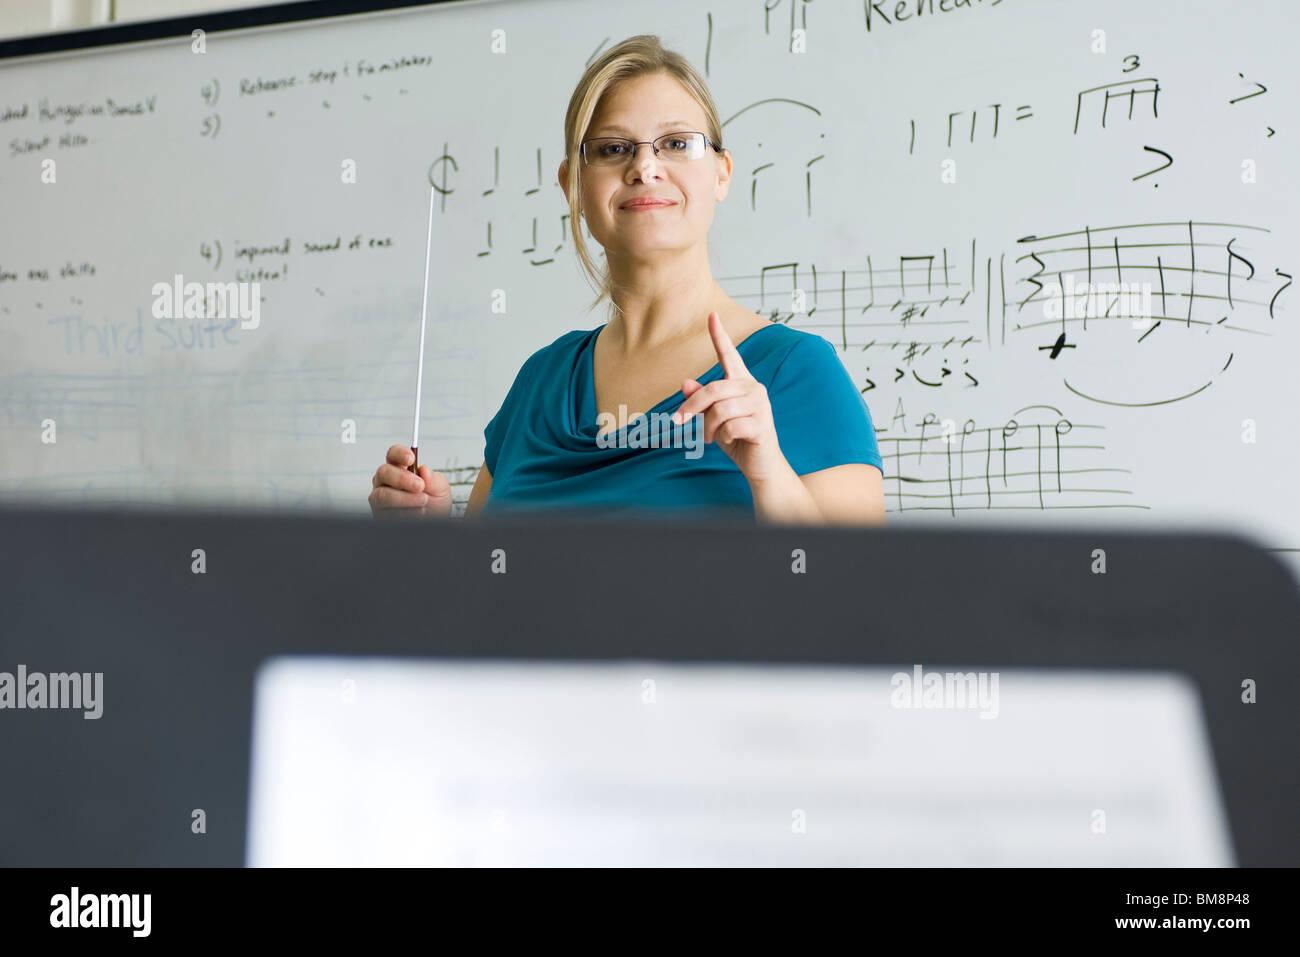 Music teacher conducting - Stock Image